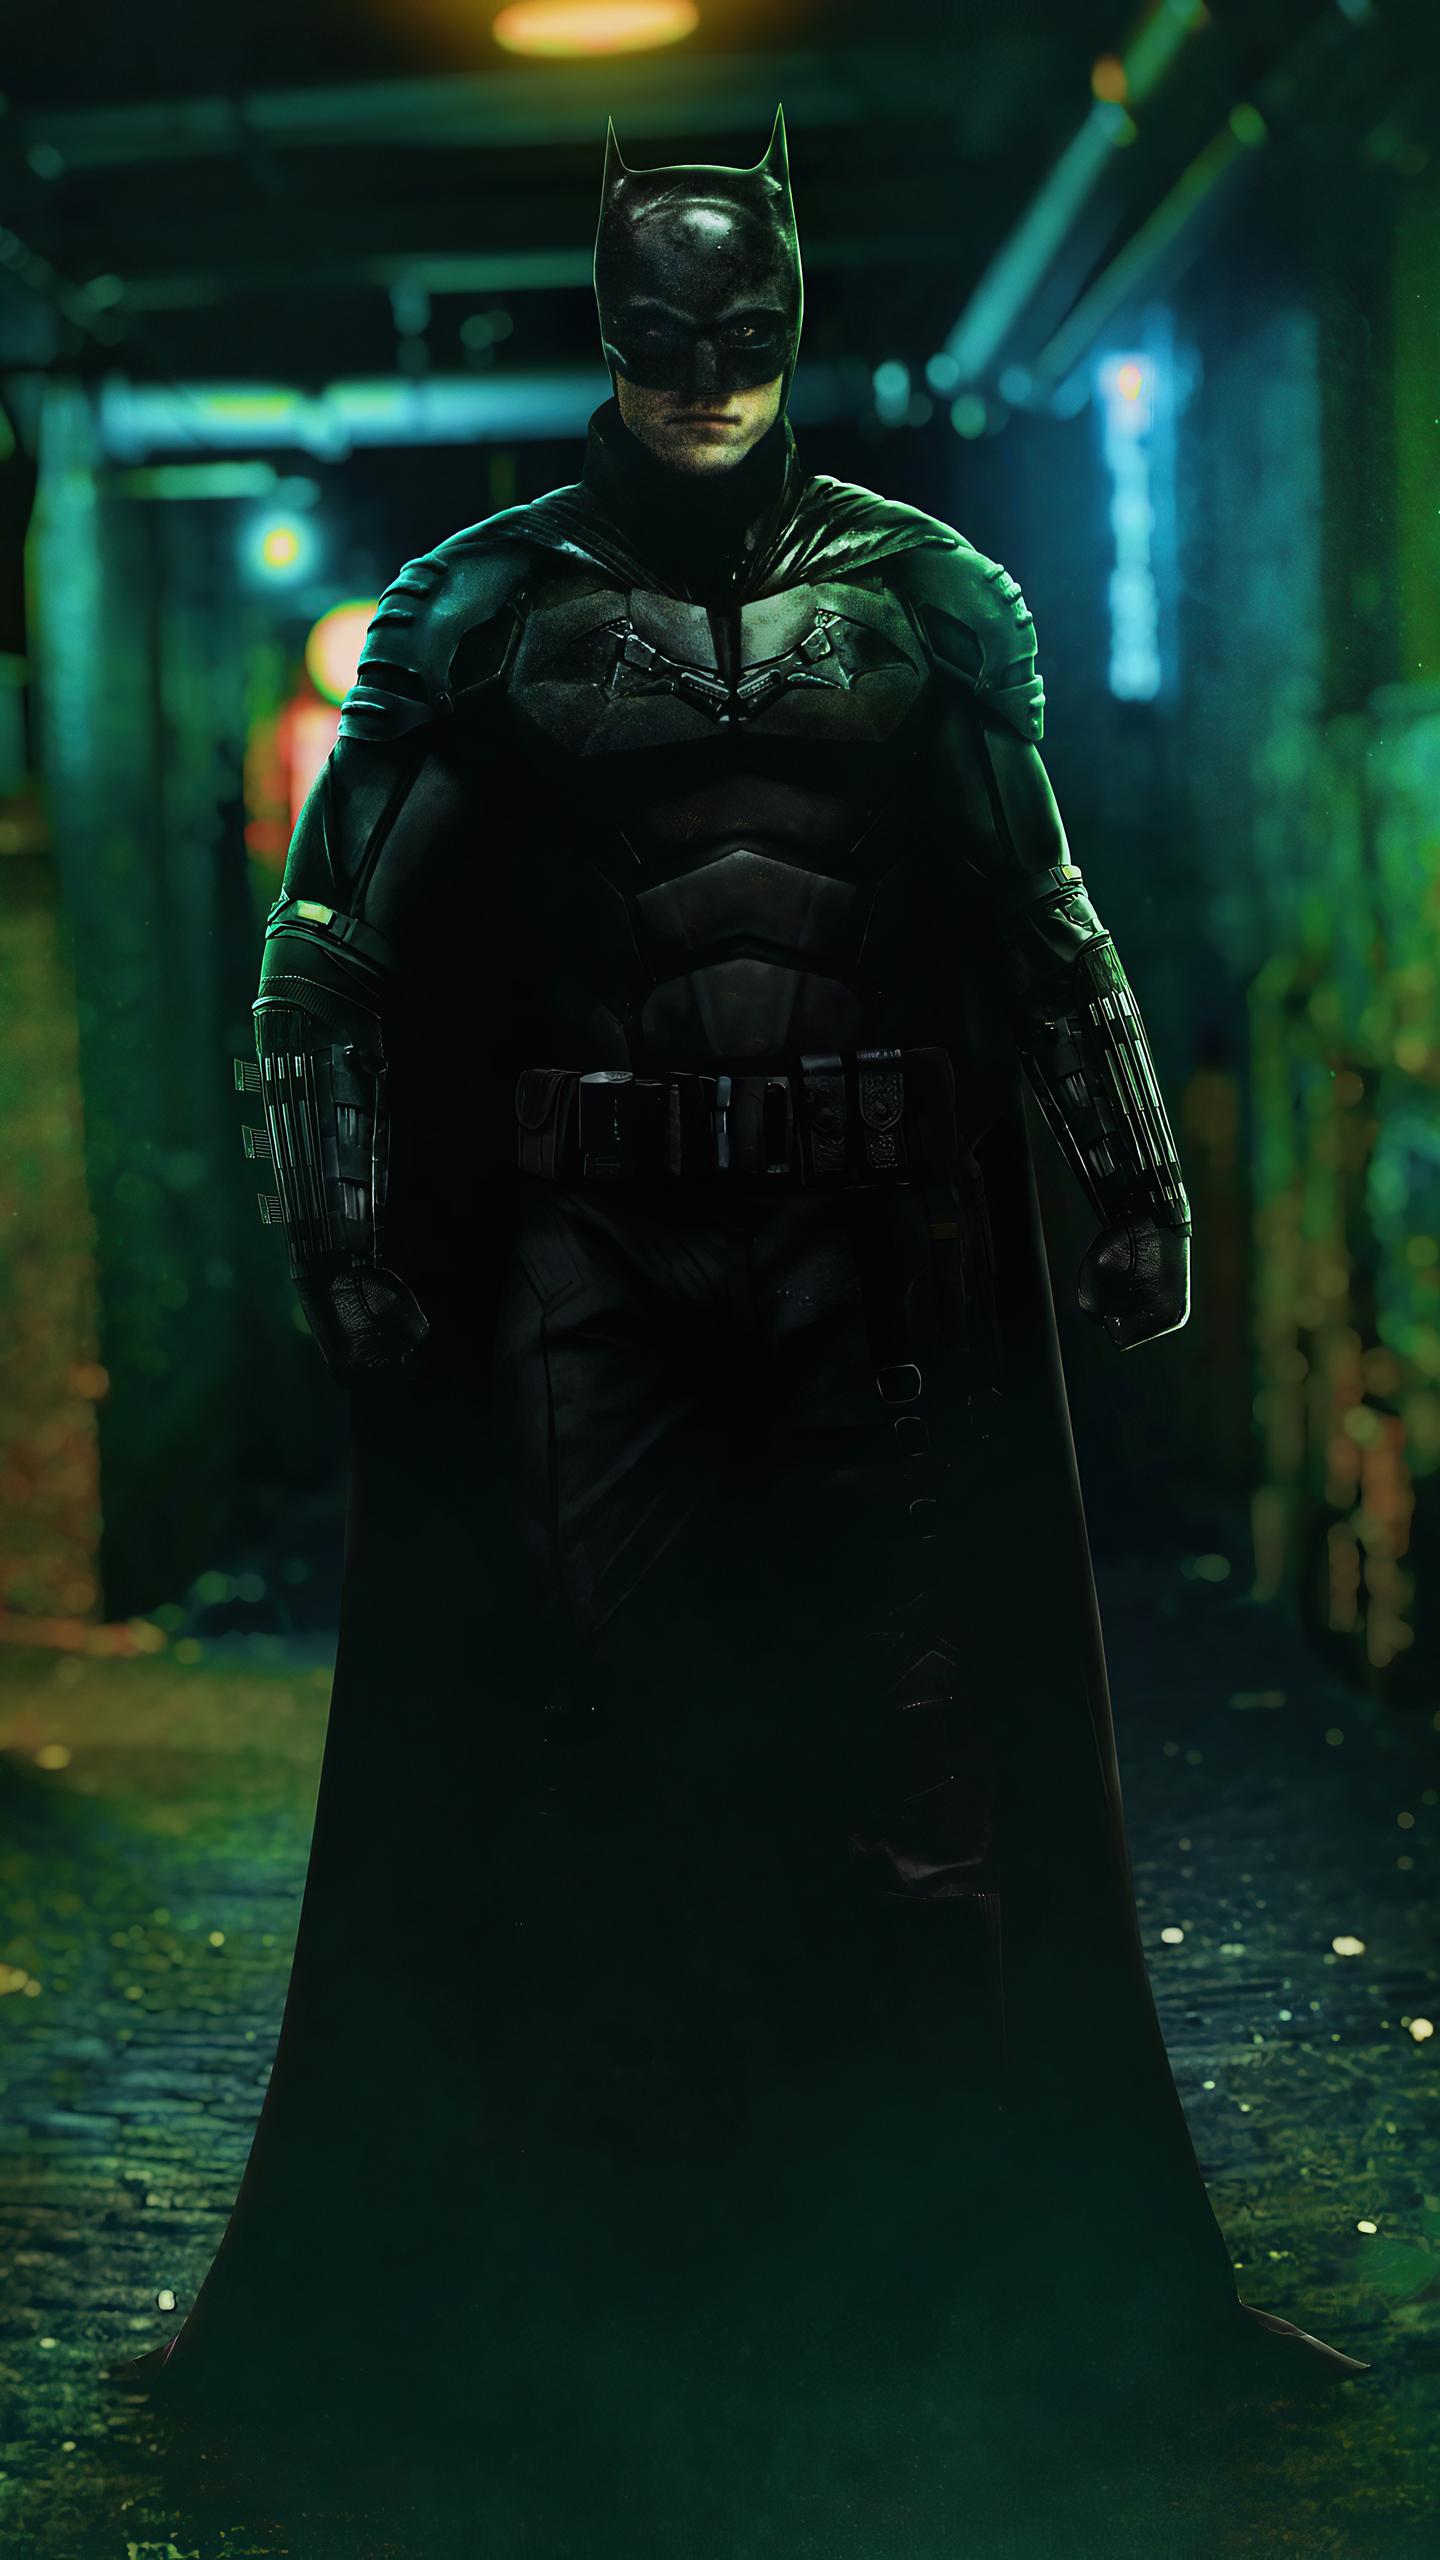 the-batman-2021-movie-artwork-h8.jpg